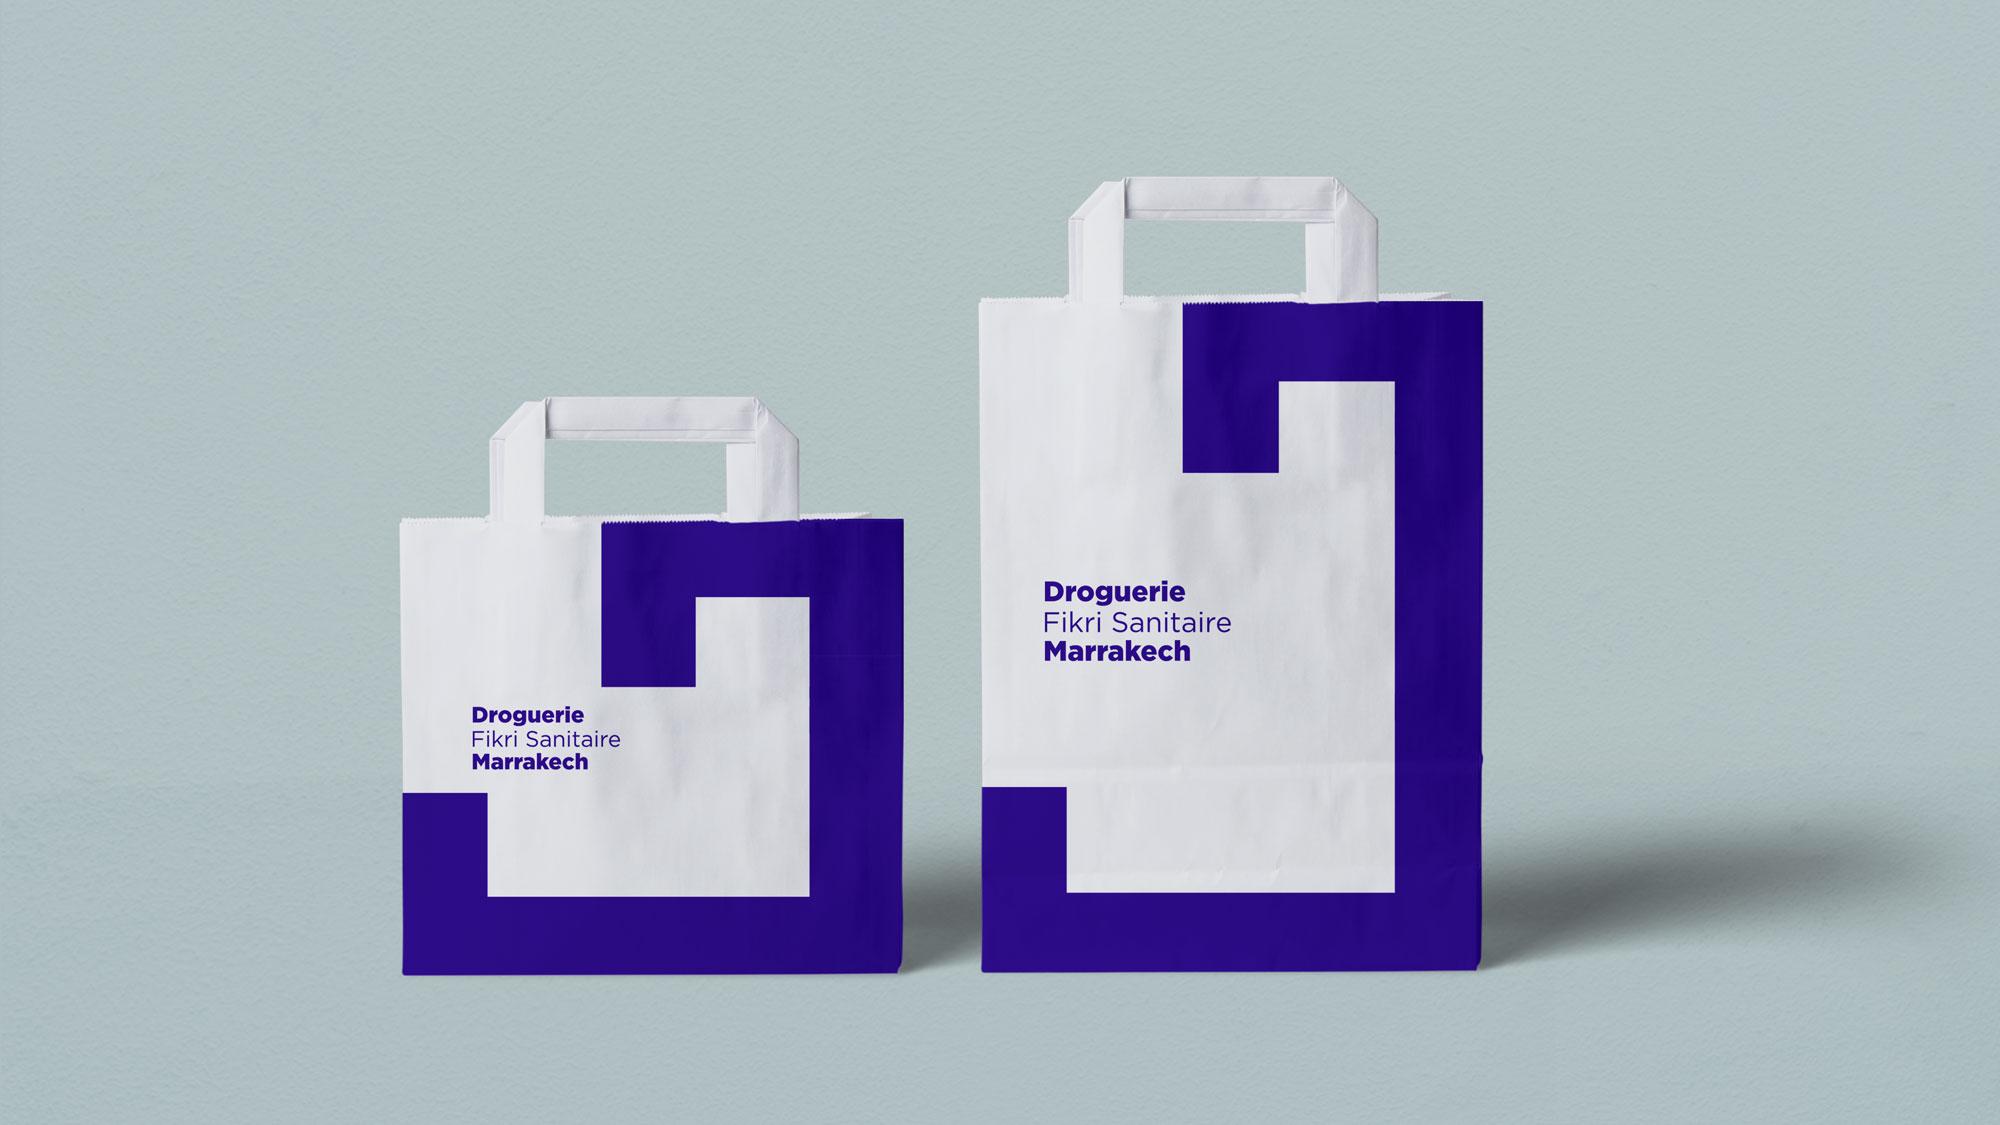 Droguerie Fikri Sanitaire Marrakech shopping bags